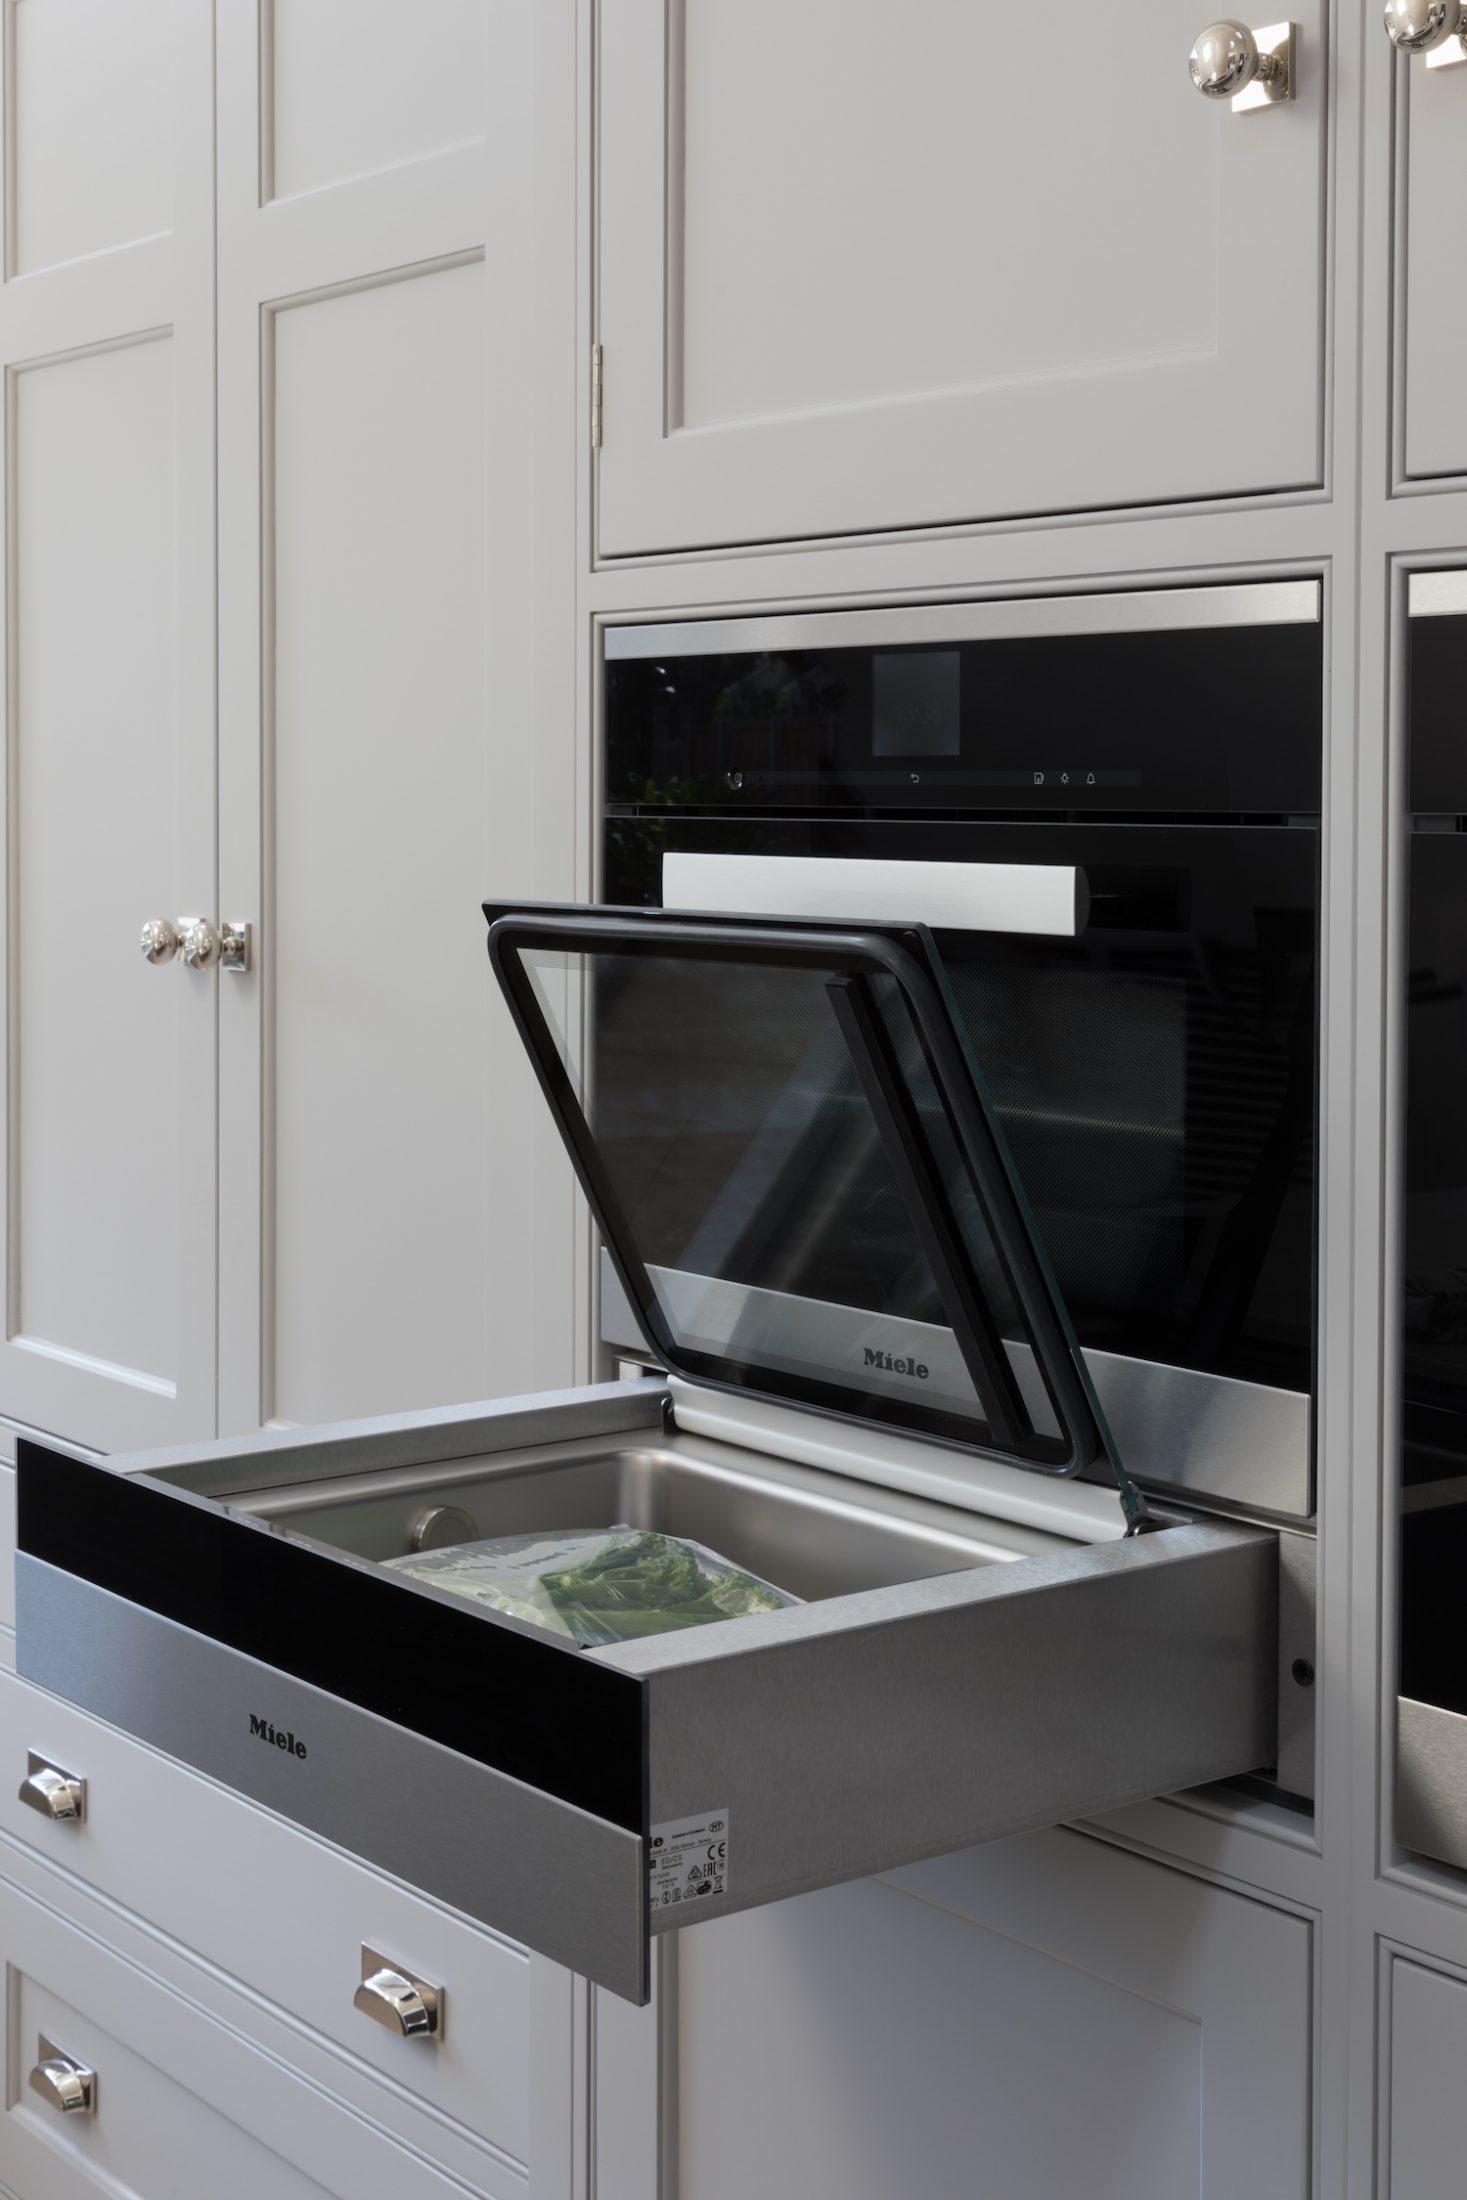 Miele Sous Vide - Vacuum Sealing Drawer - Humphrey Munson